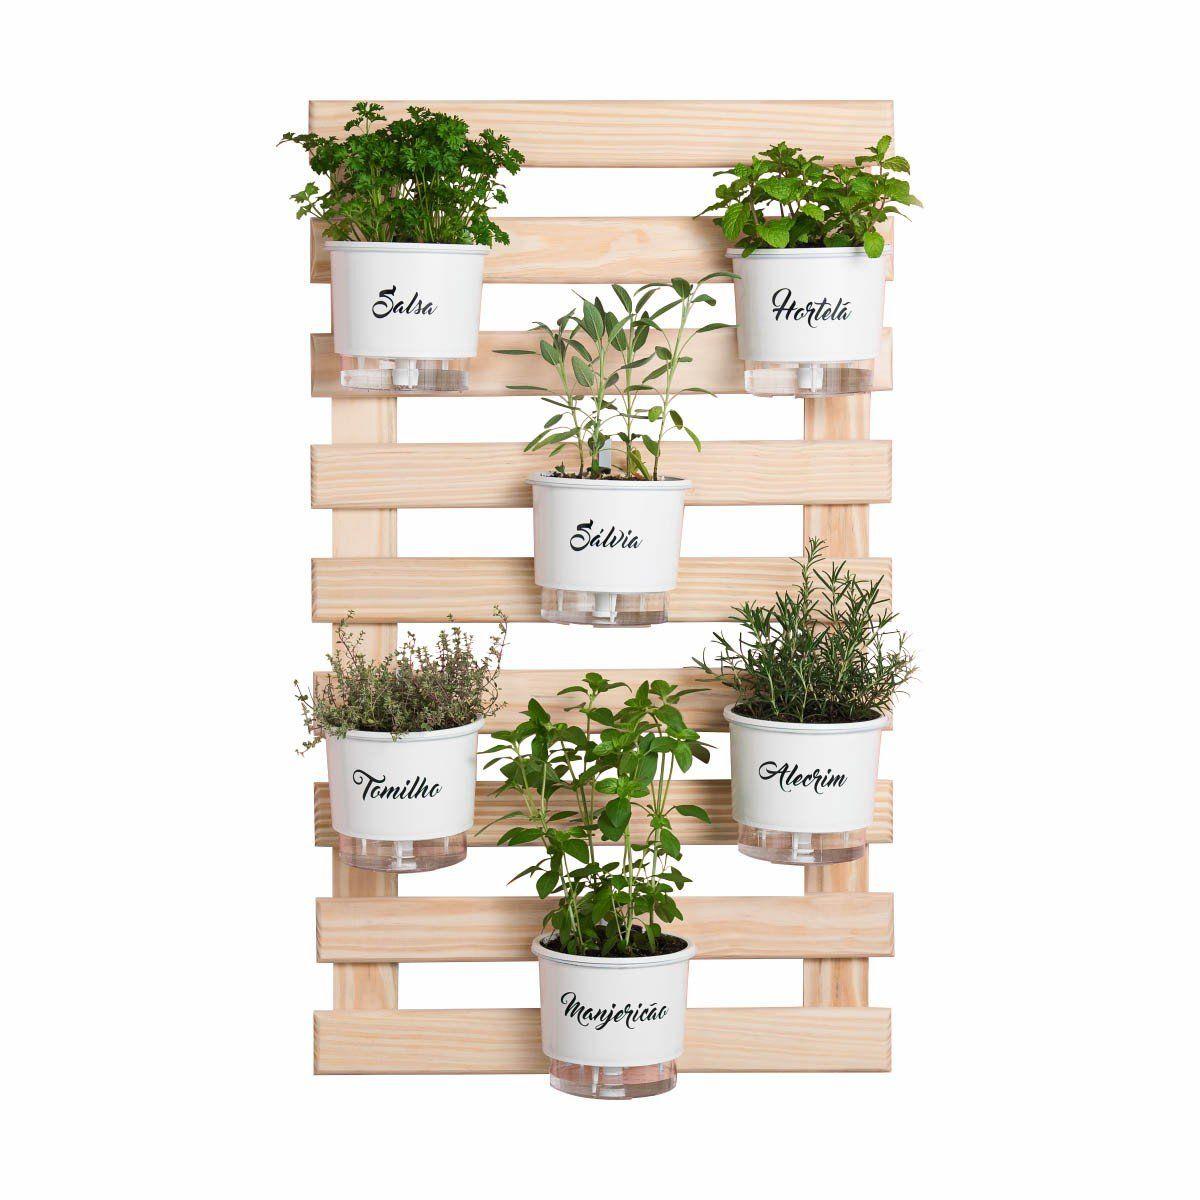 Kit Horta Vertical 6 Vasos Gourmet Branco 100cm x 60cm Acompanha: Treliça + Vasos + Suportes + Substrato + Sementes